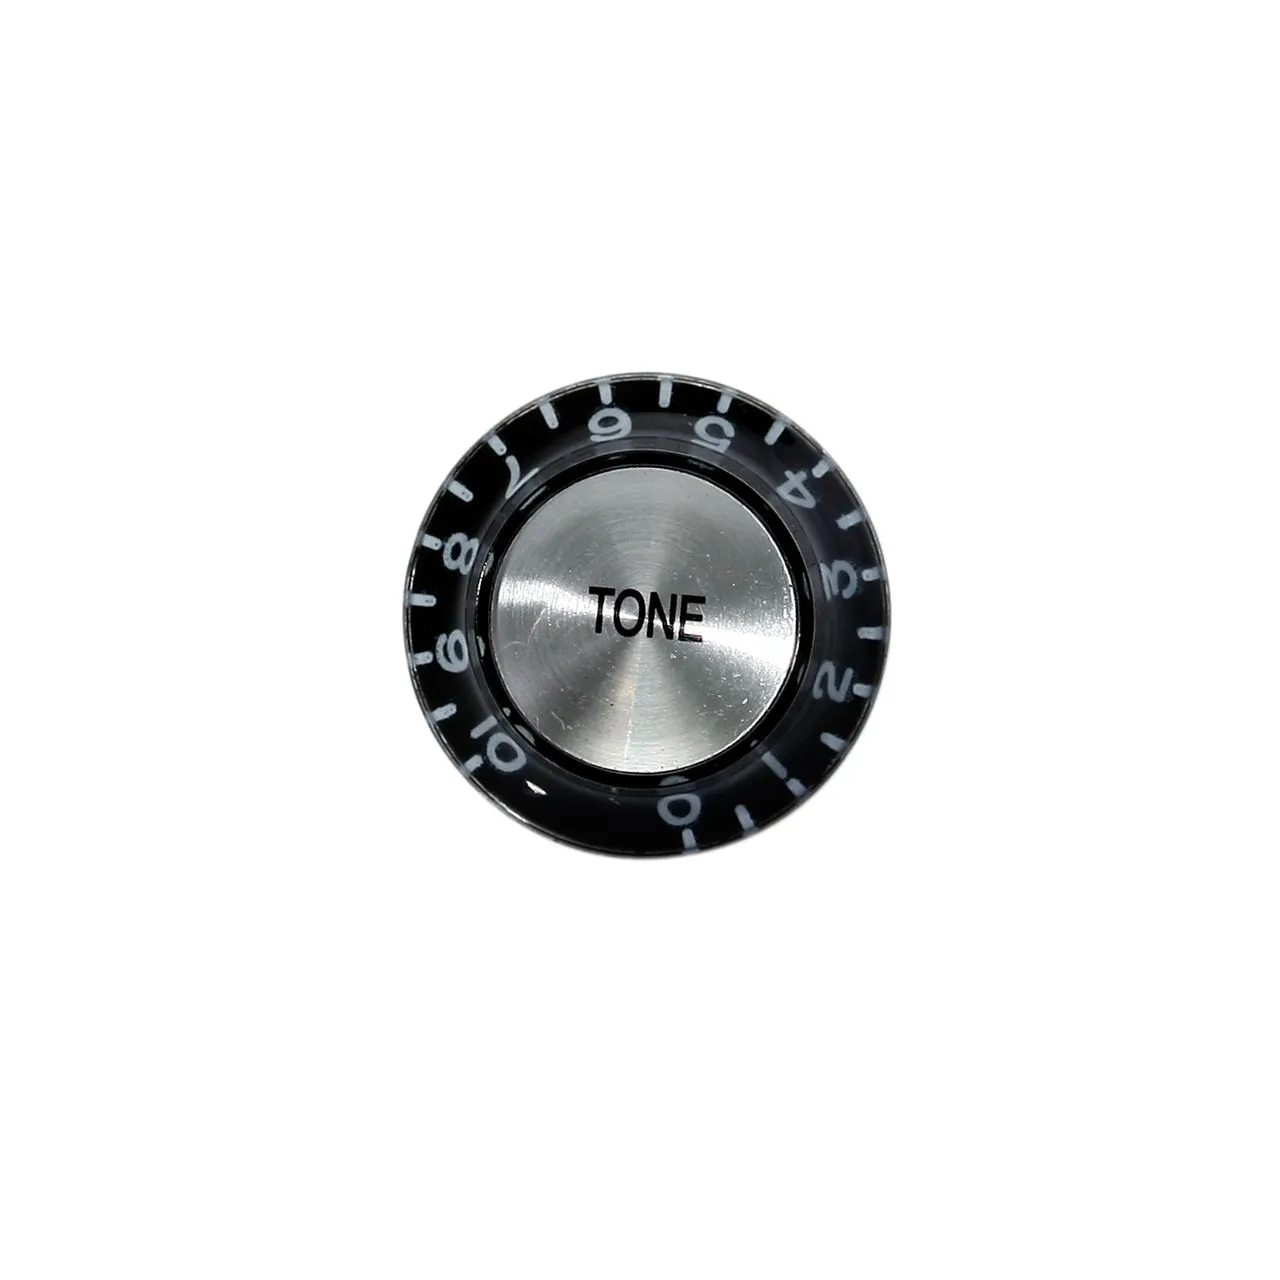 Knob Tone Mod Sg Preto Pct C/4 Dolphin